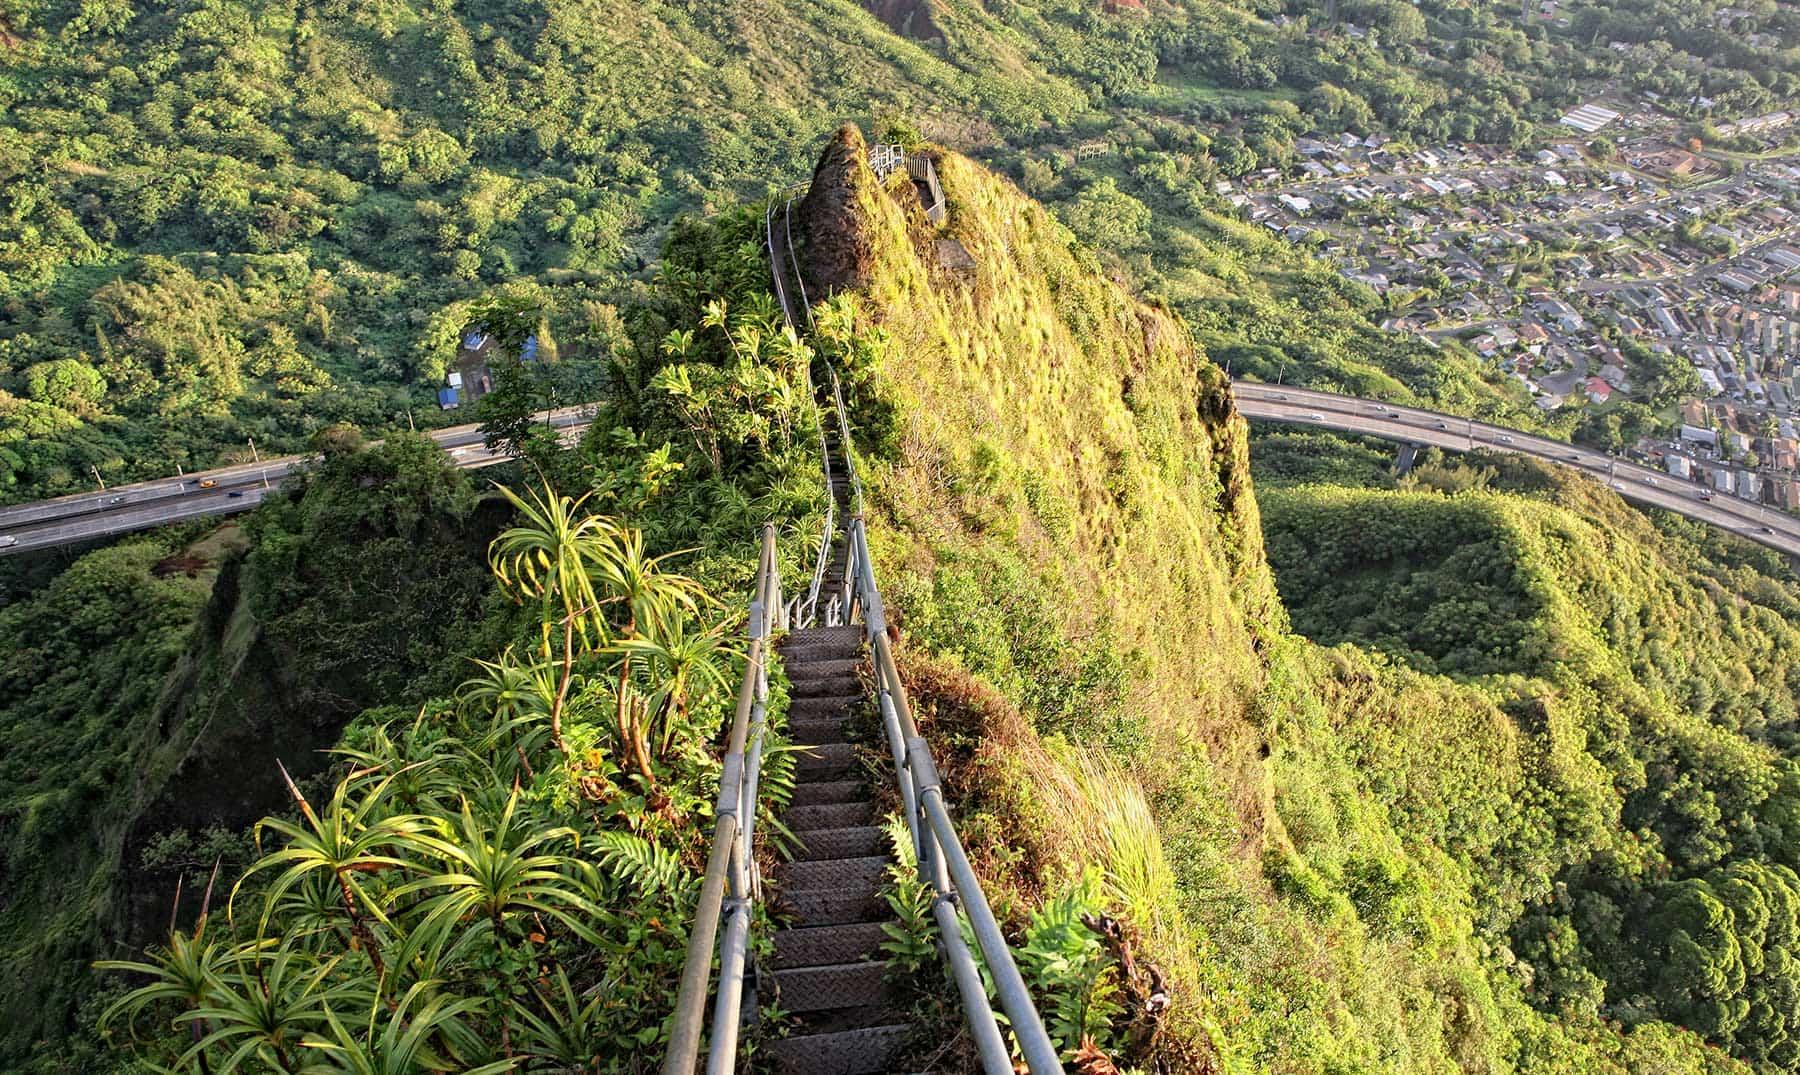 escaleras peligrosas 8 escaleras haiku